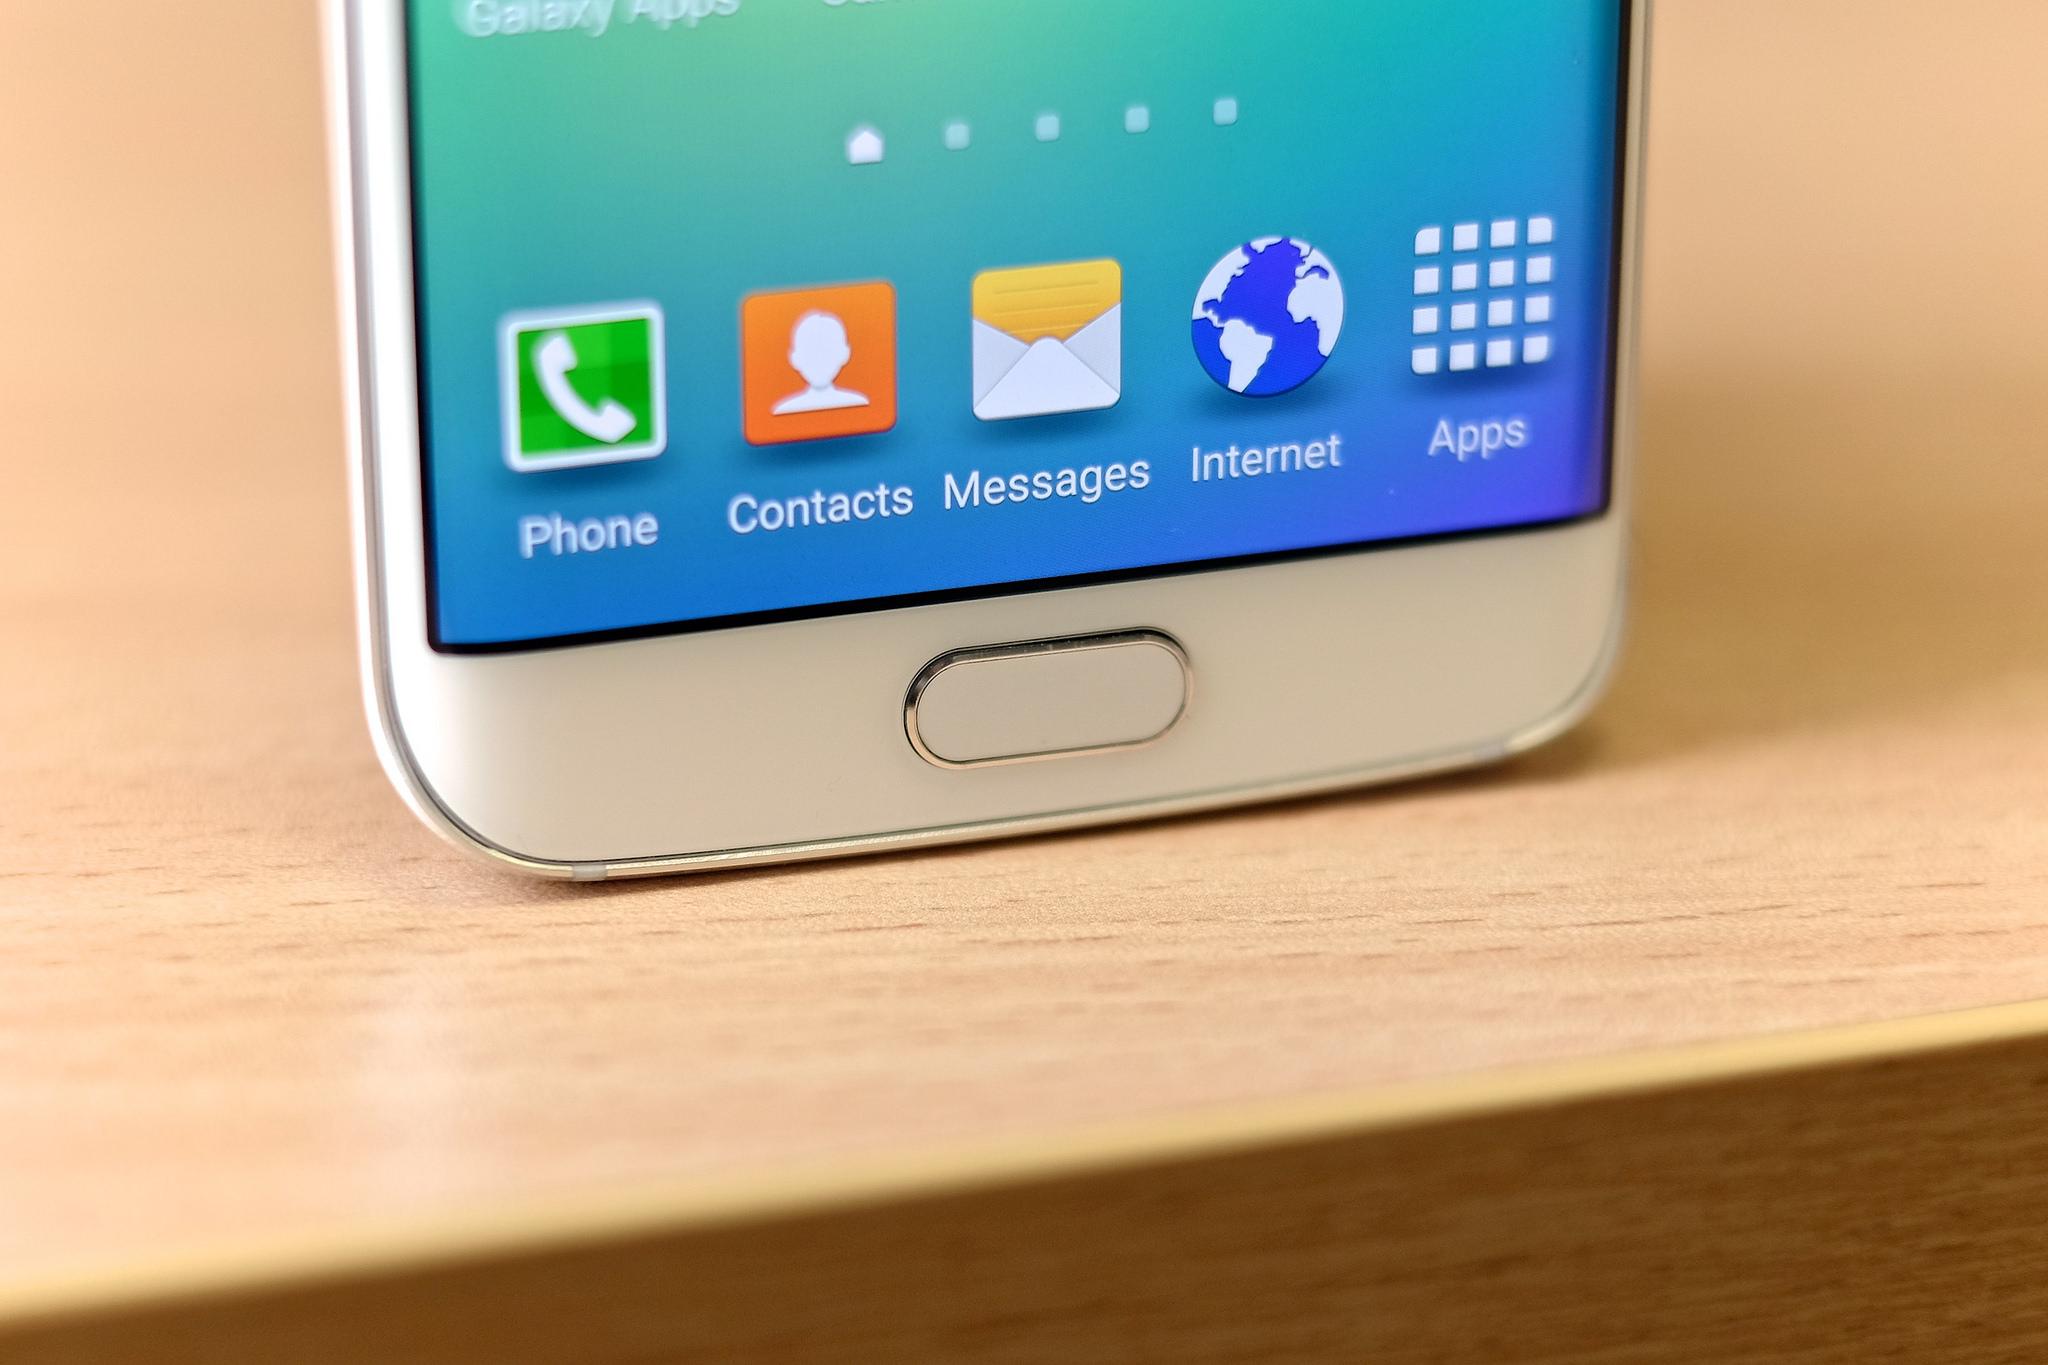 Samsung、広告ブロック機能を開発するもGoogleに速攻で削除される